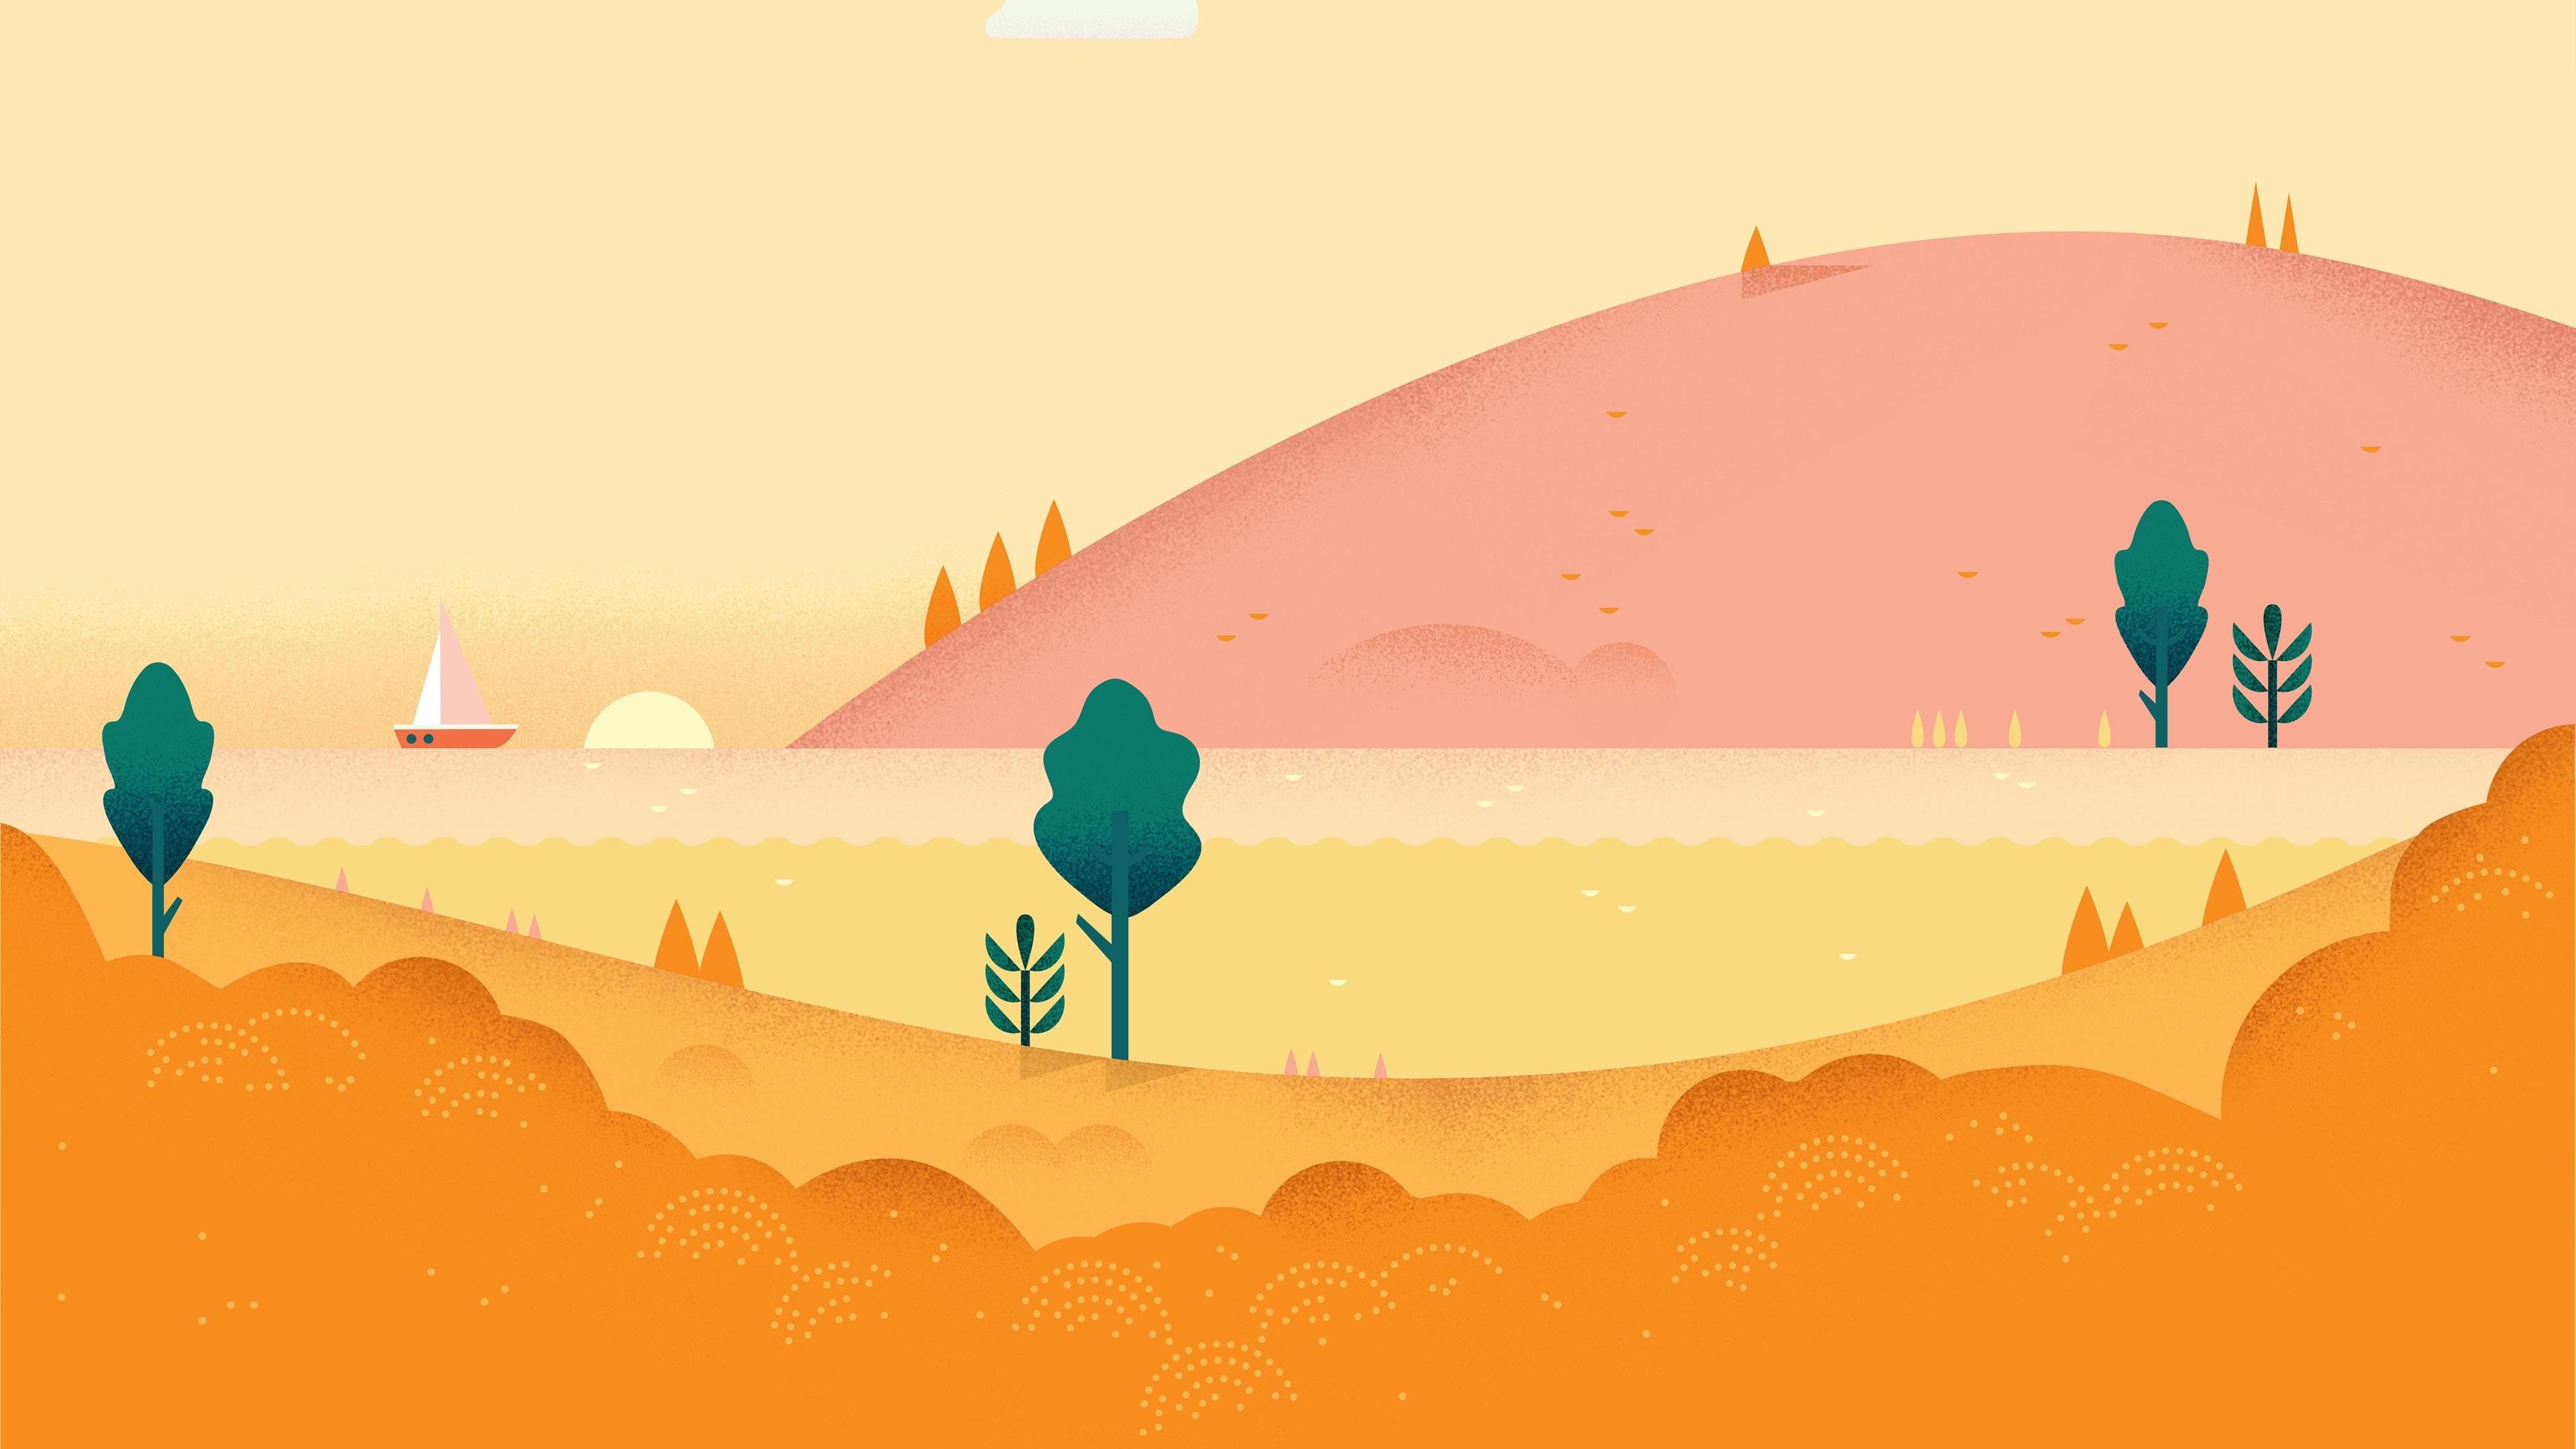 android 3840x2160 5k 4k hd wallpaper pattern landscape orange yellow 3431